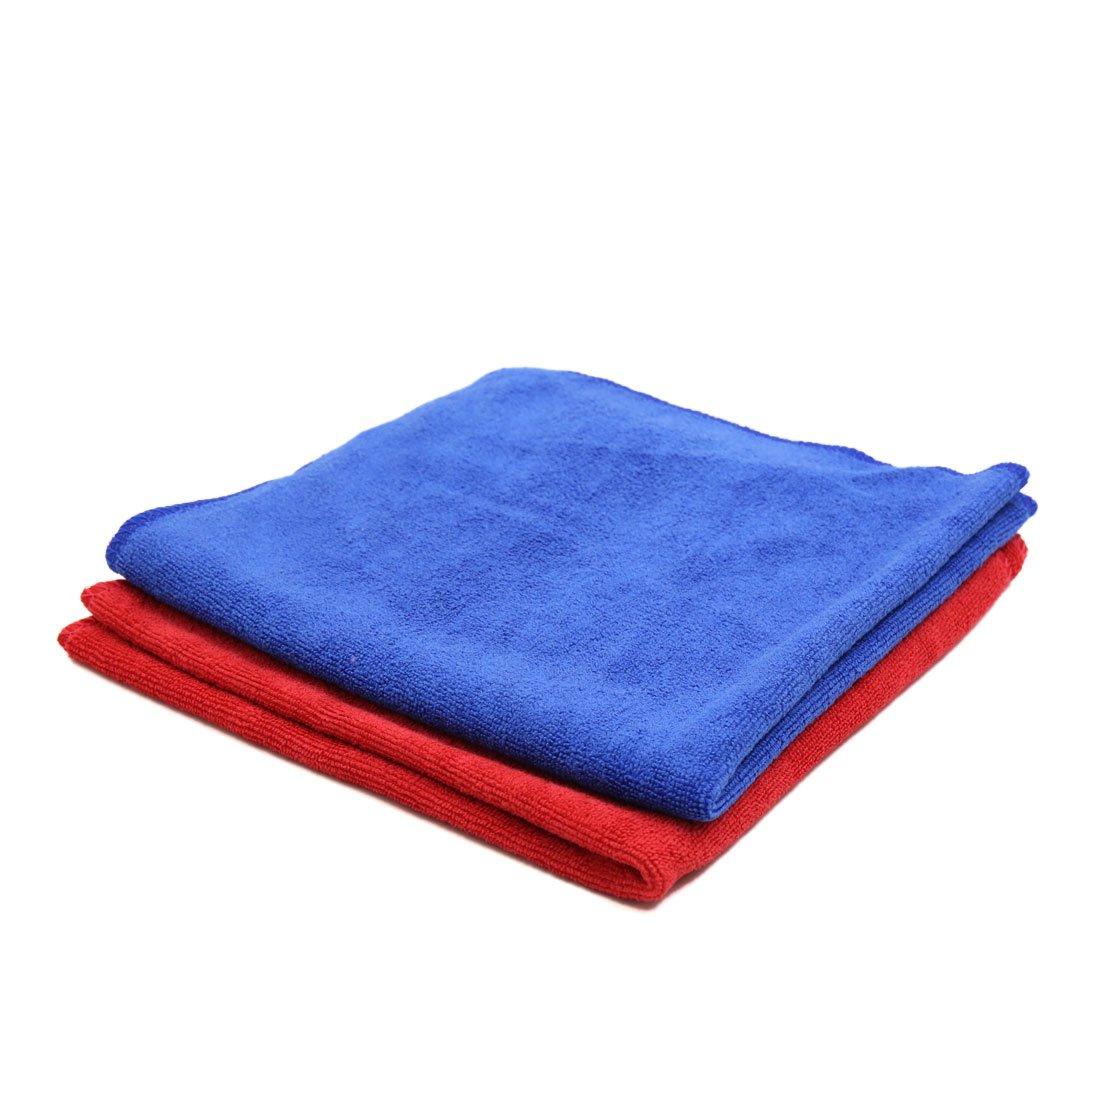 sourcingmap 2pz 40 x 40cm 300gsm in microfibra asciugamano auto Lavaggio Asciugatura panno rosso blu sourcing map a17030600ux0185